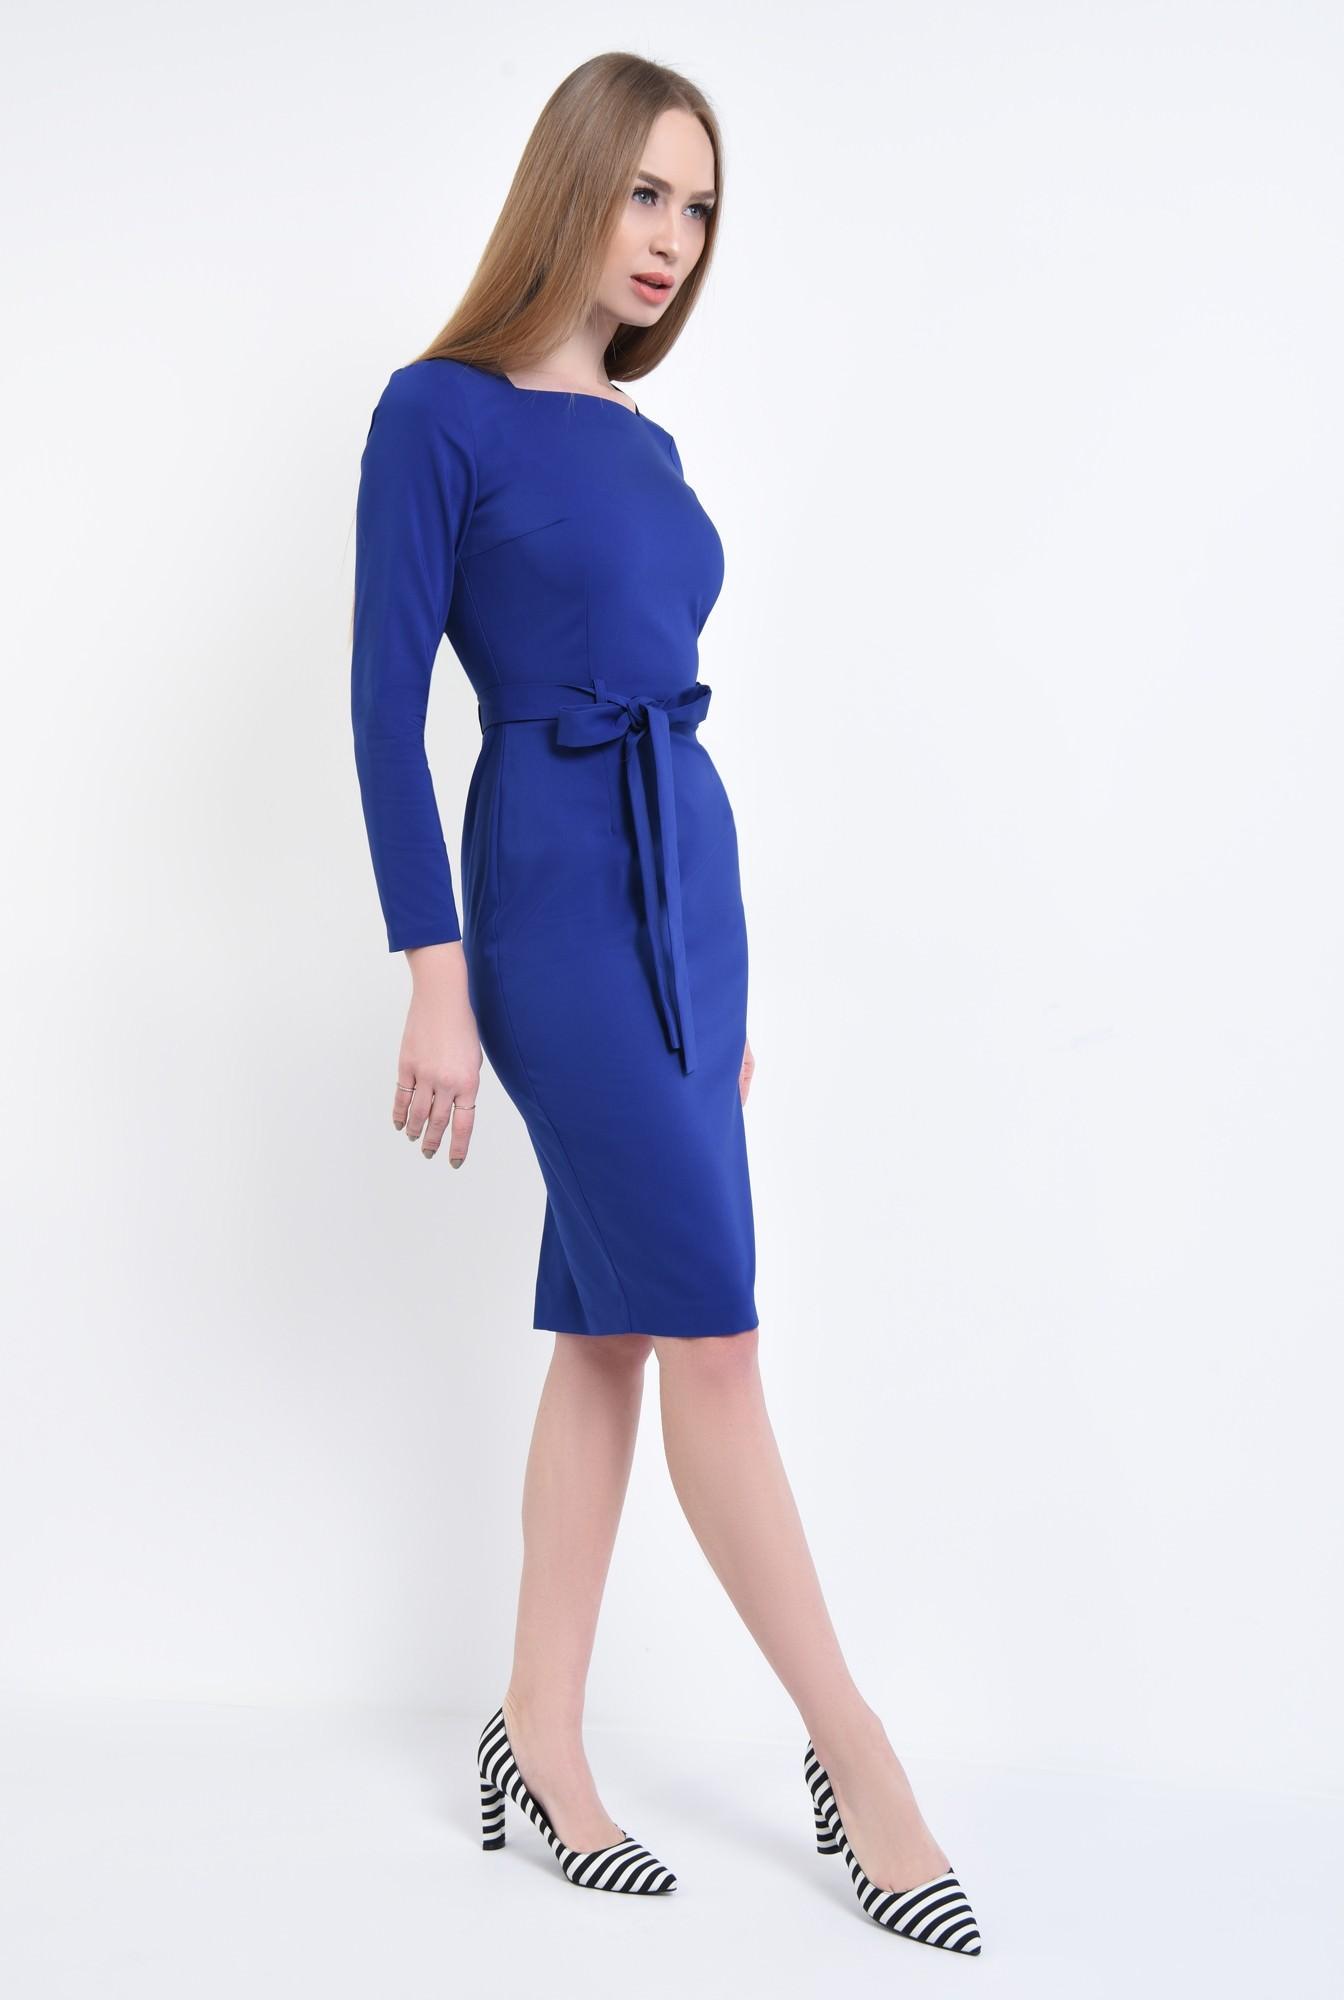 3 - rochie de zi, conica, albastru, cordon